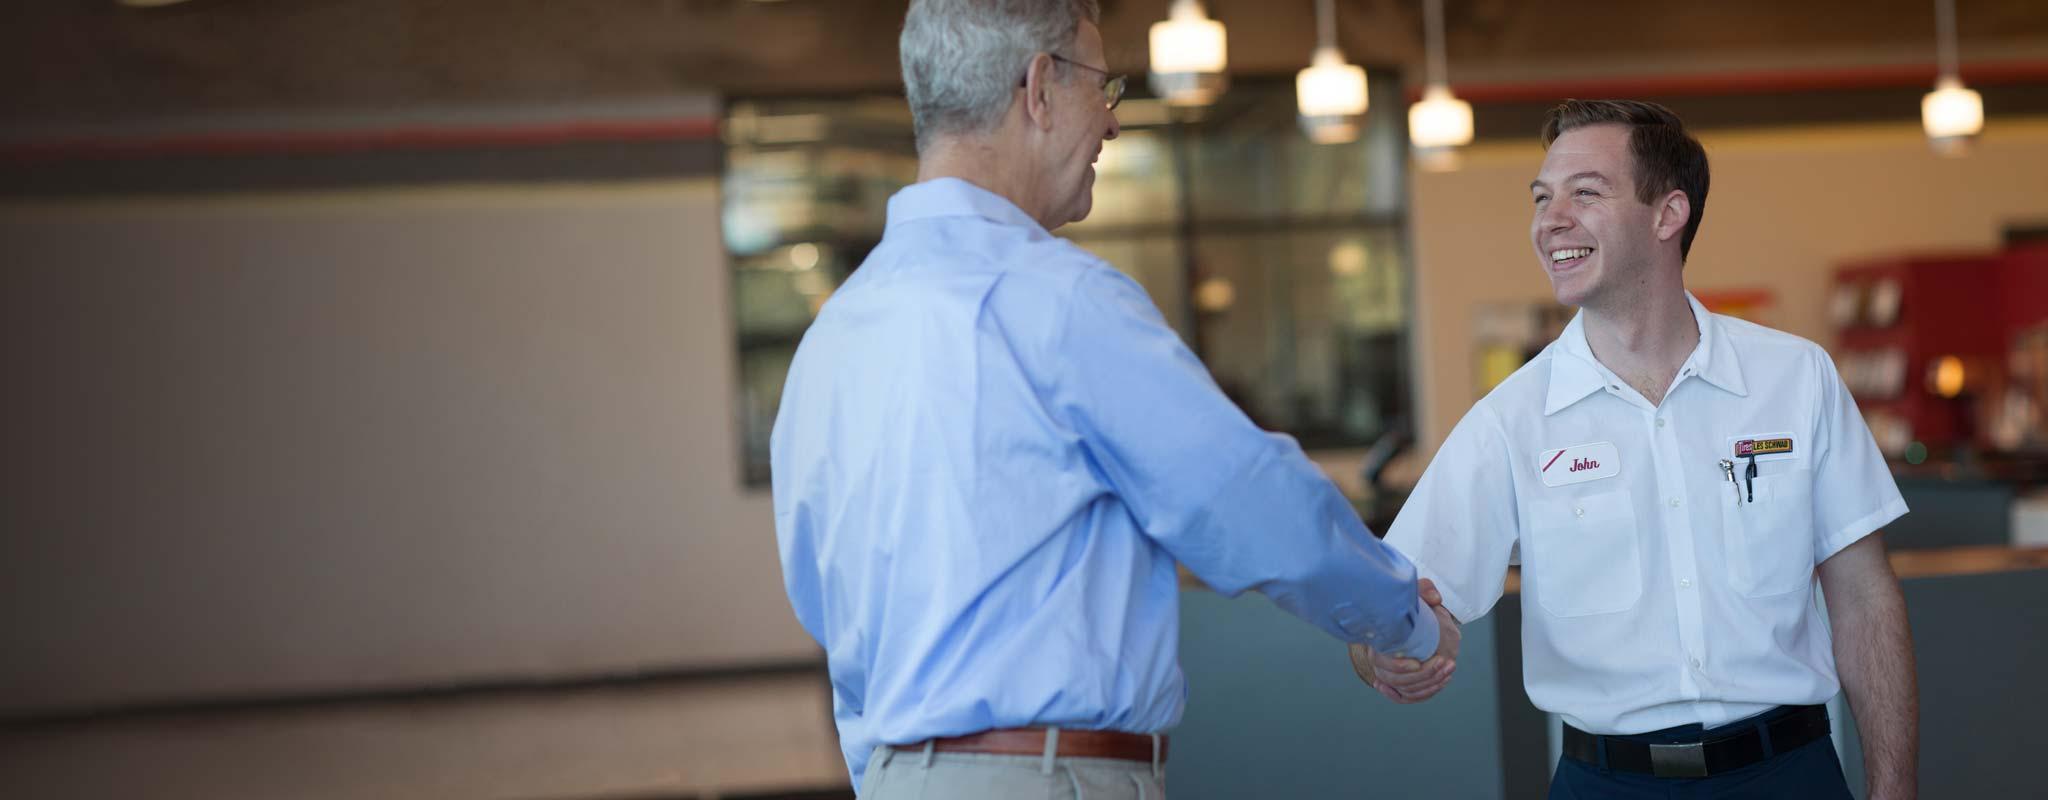 Les Schwab employee shakes a customers hand.